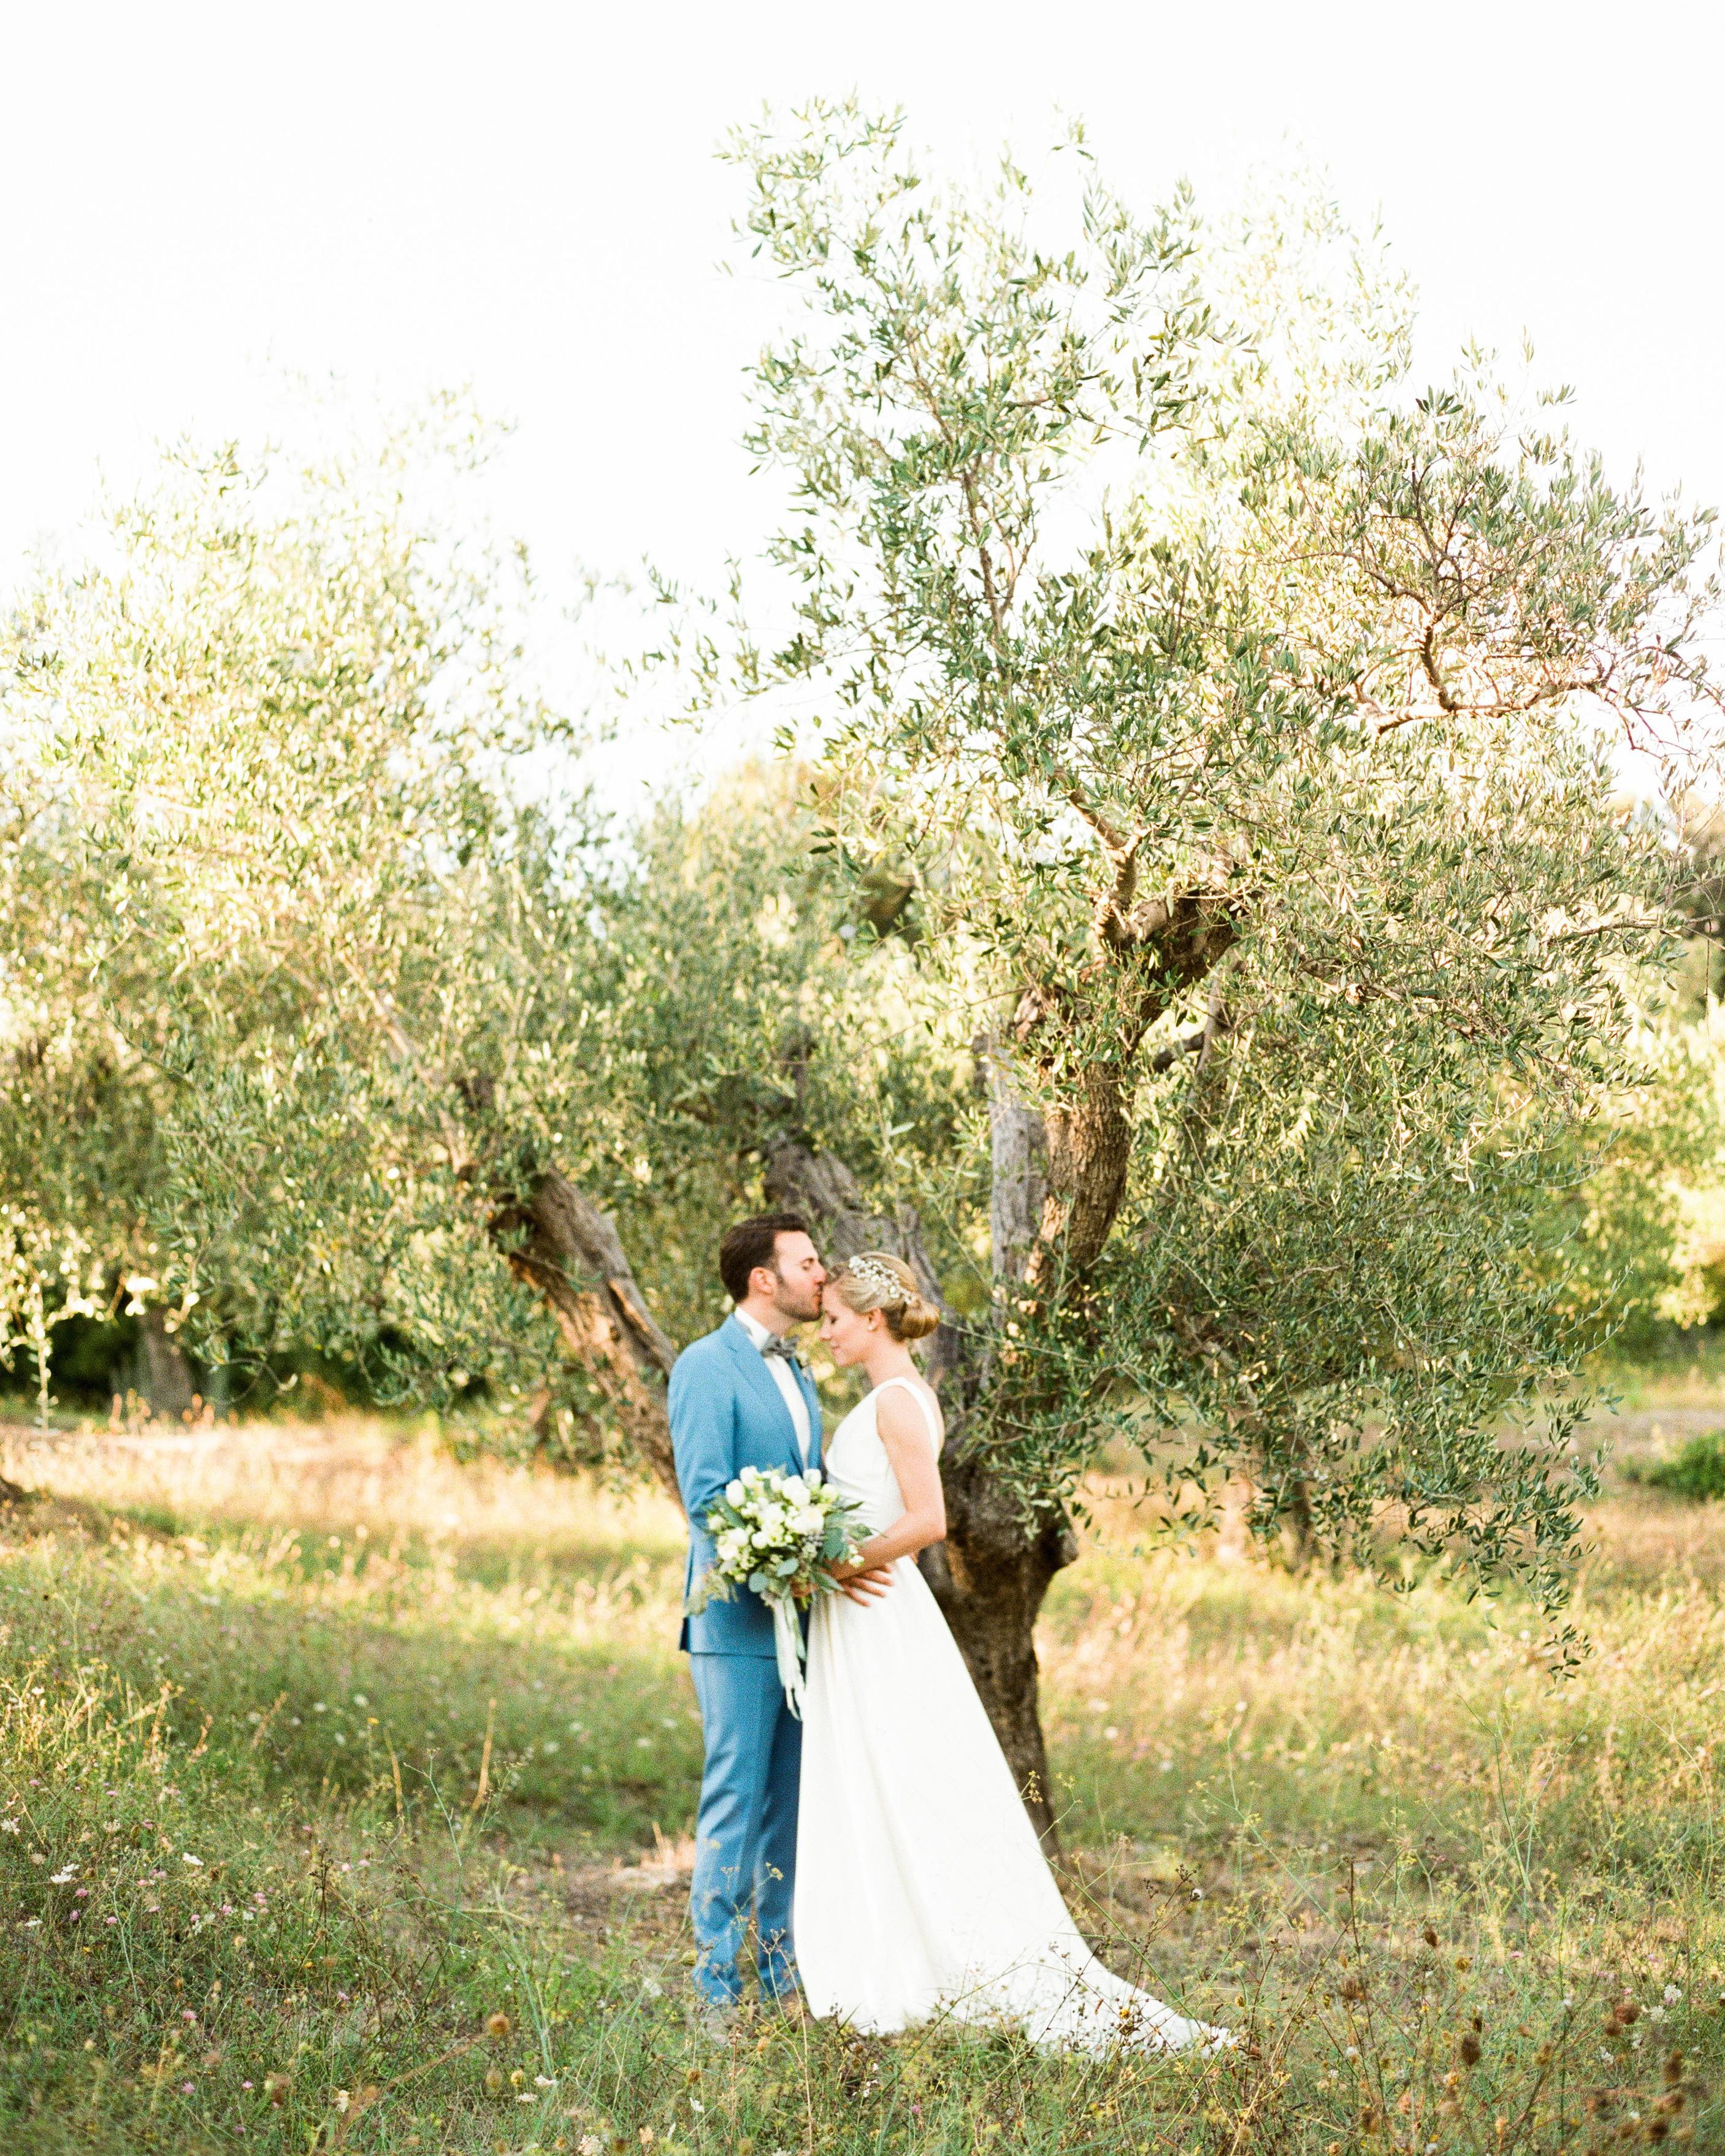 regina-jack-wedding-couple-39-s111820-0215.jpg